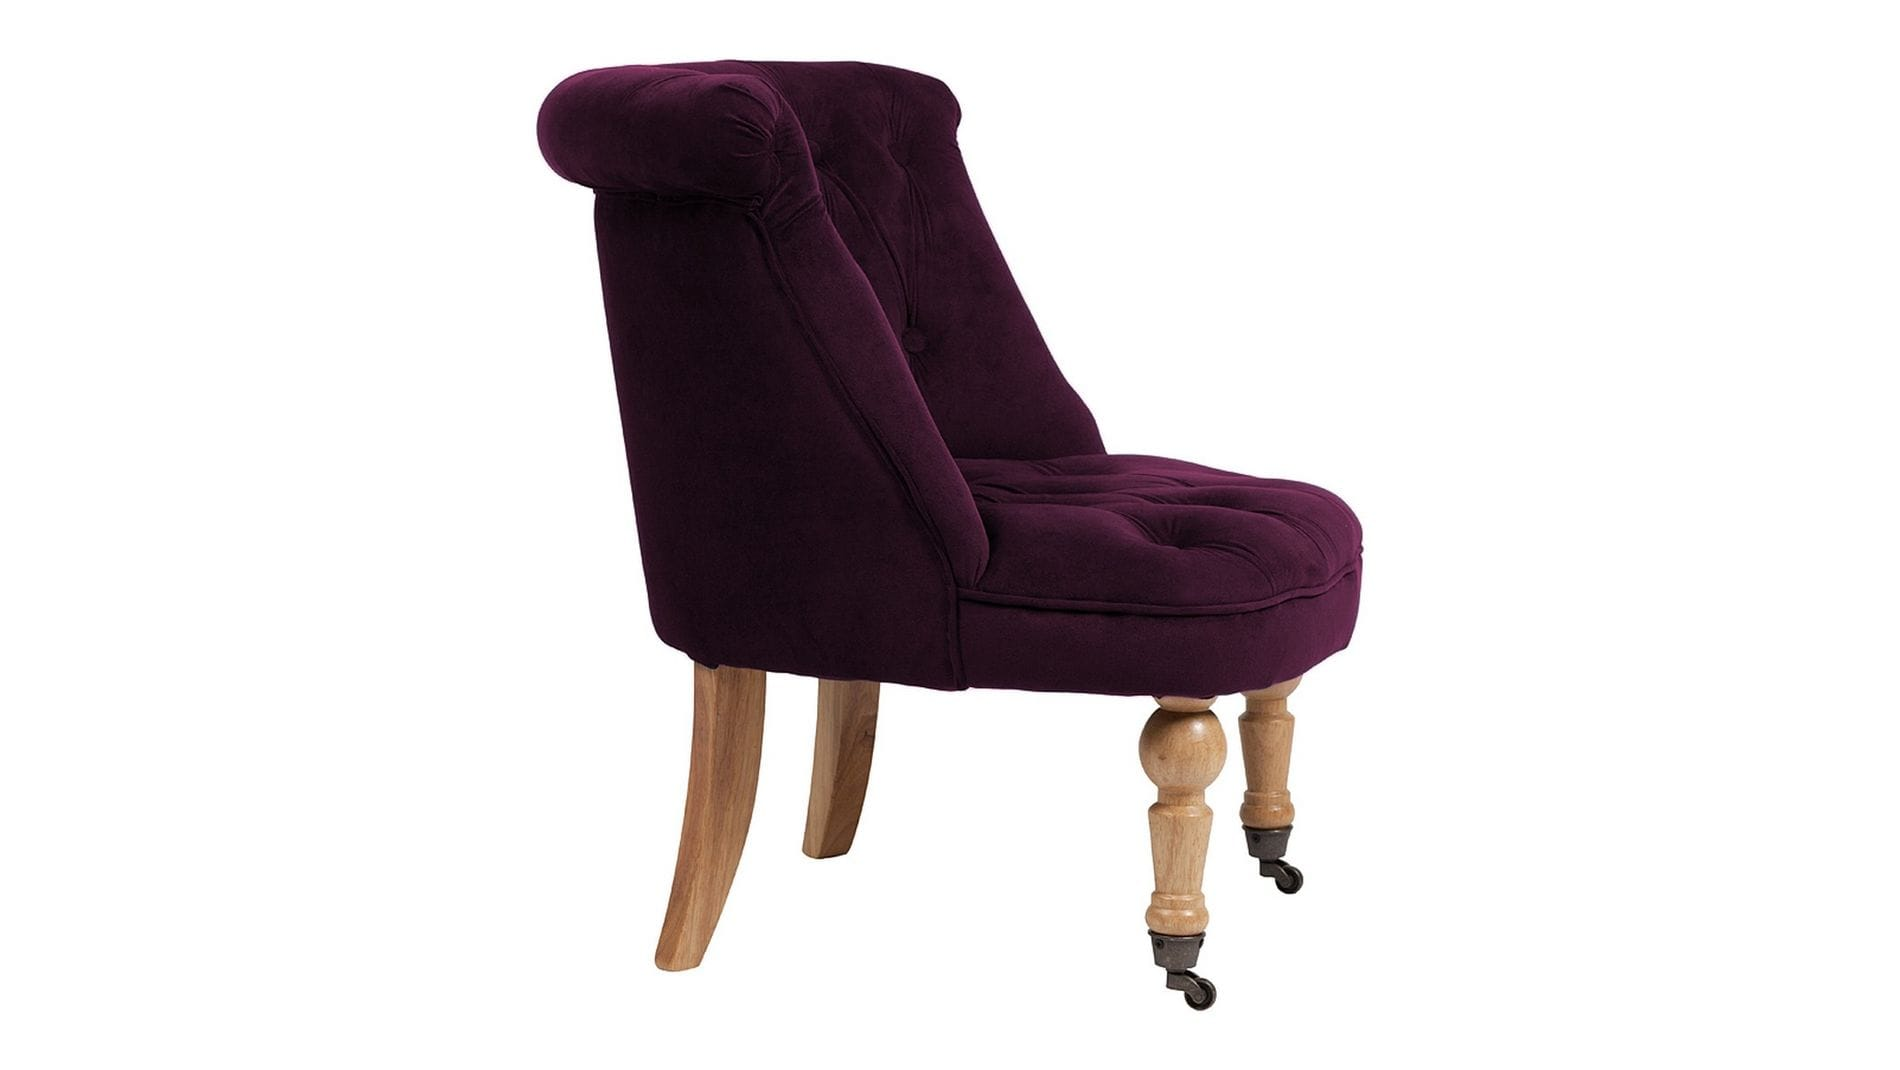 Кресло Amelie French Country Chair Лиловый Велюр М